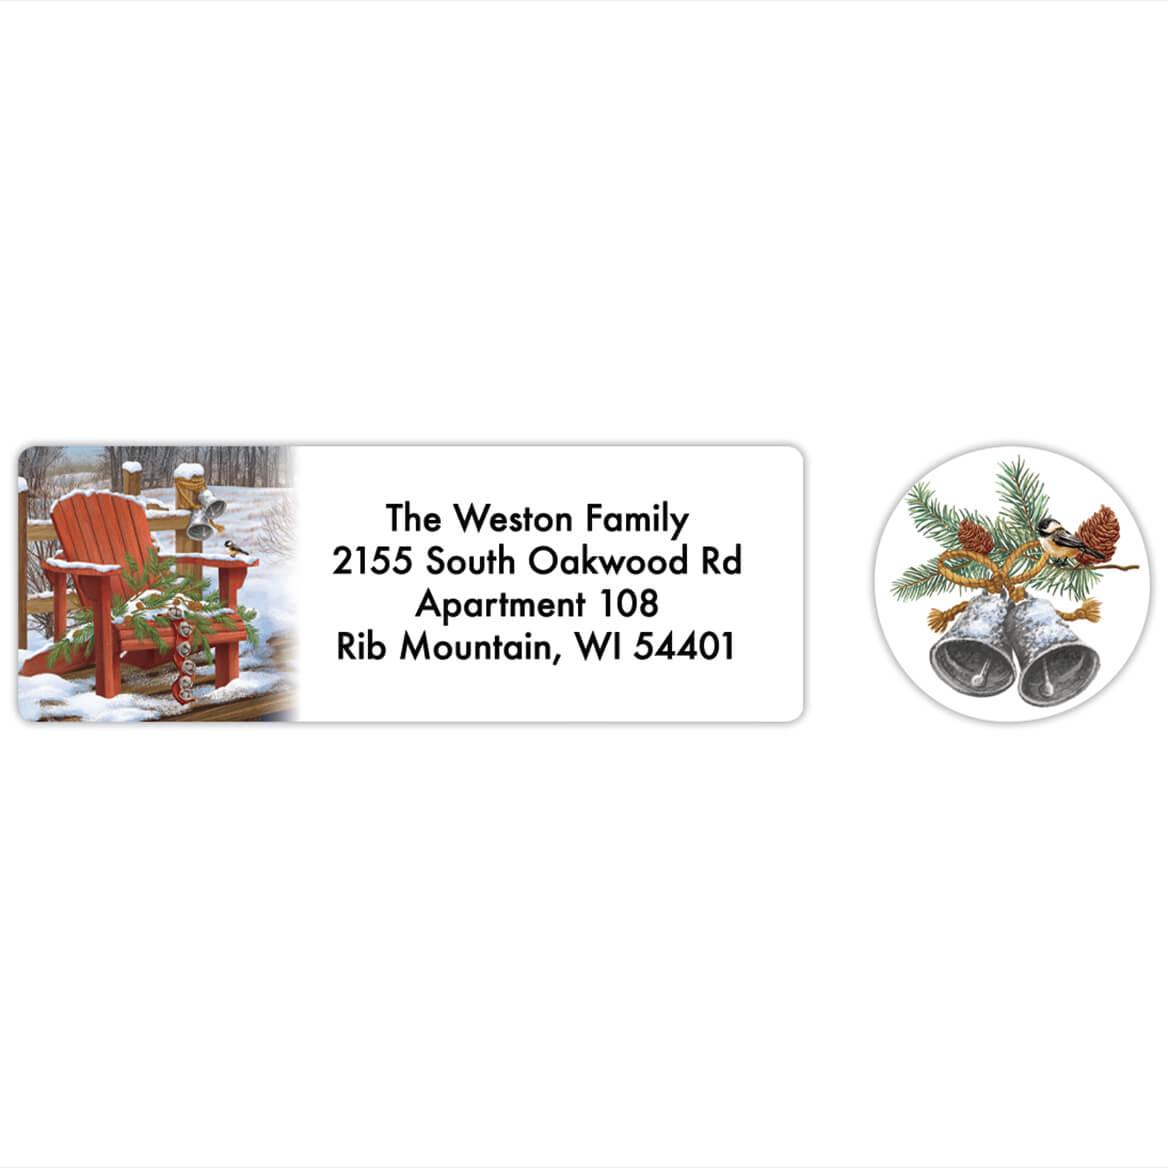 Personalized Adirondak Chair Labels & Seals 20-368272